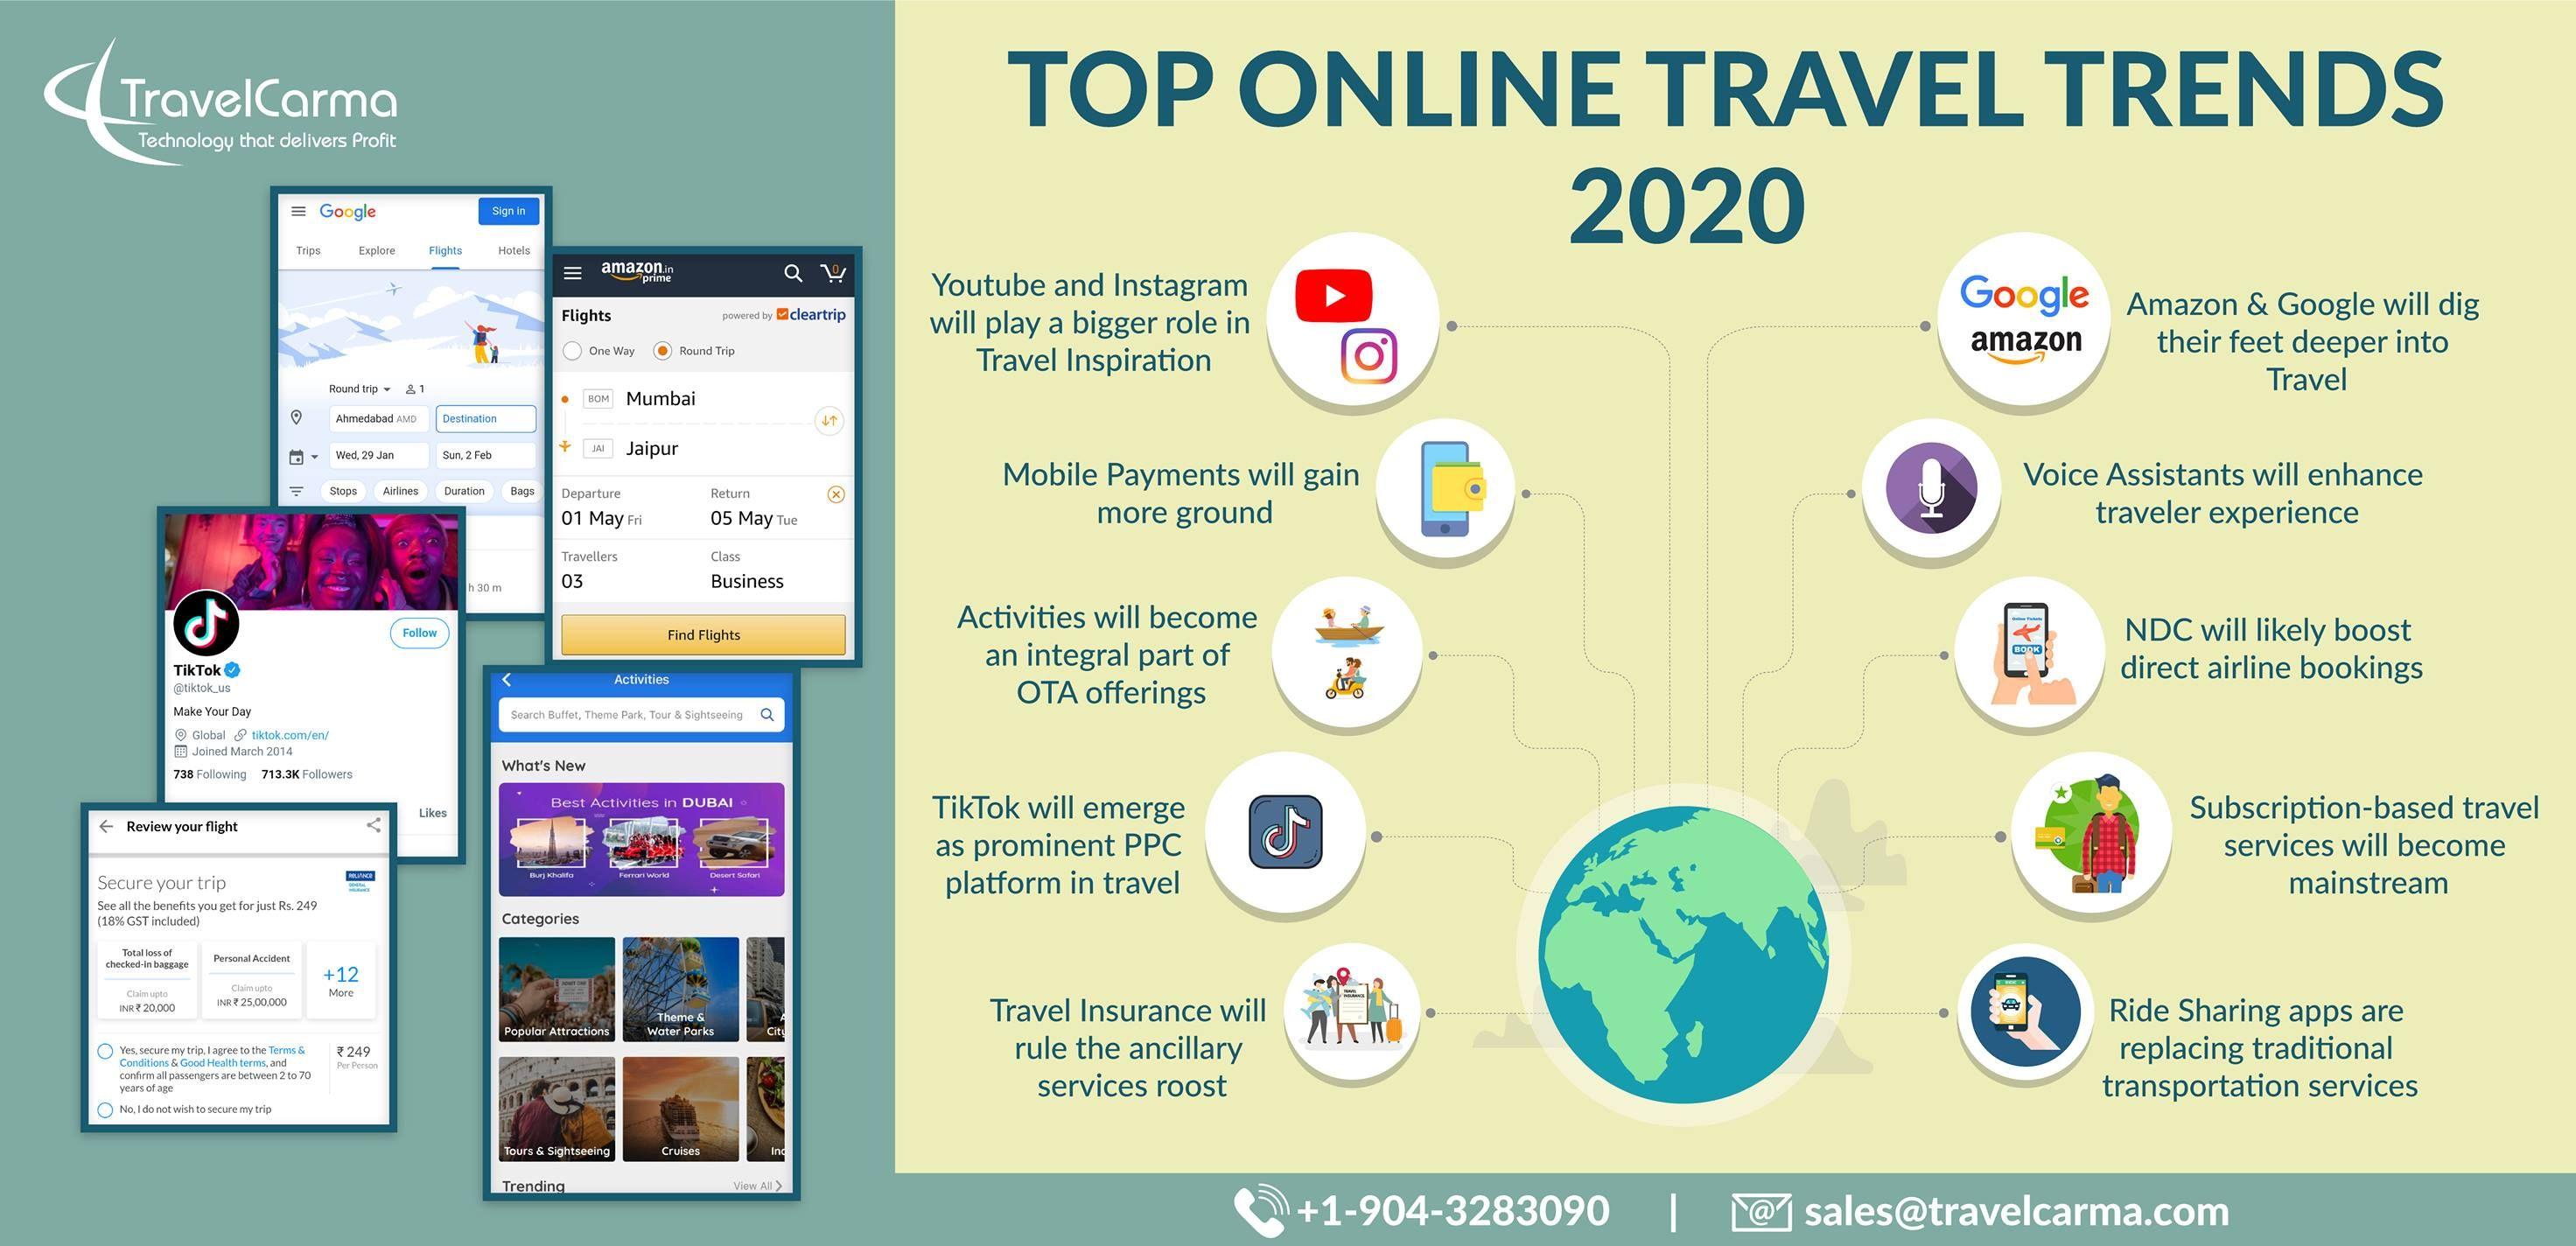 Top 10 Online Travel Trends 2020 Travel Trends Online Travel Travel Technology